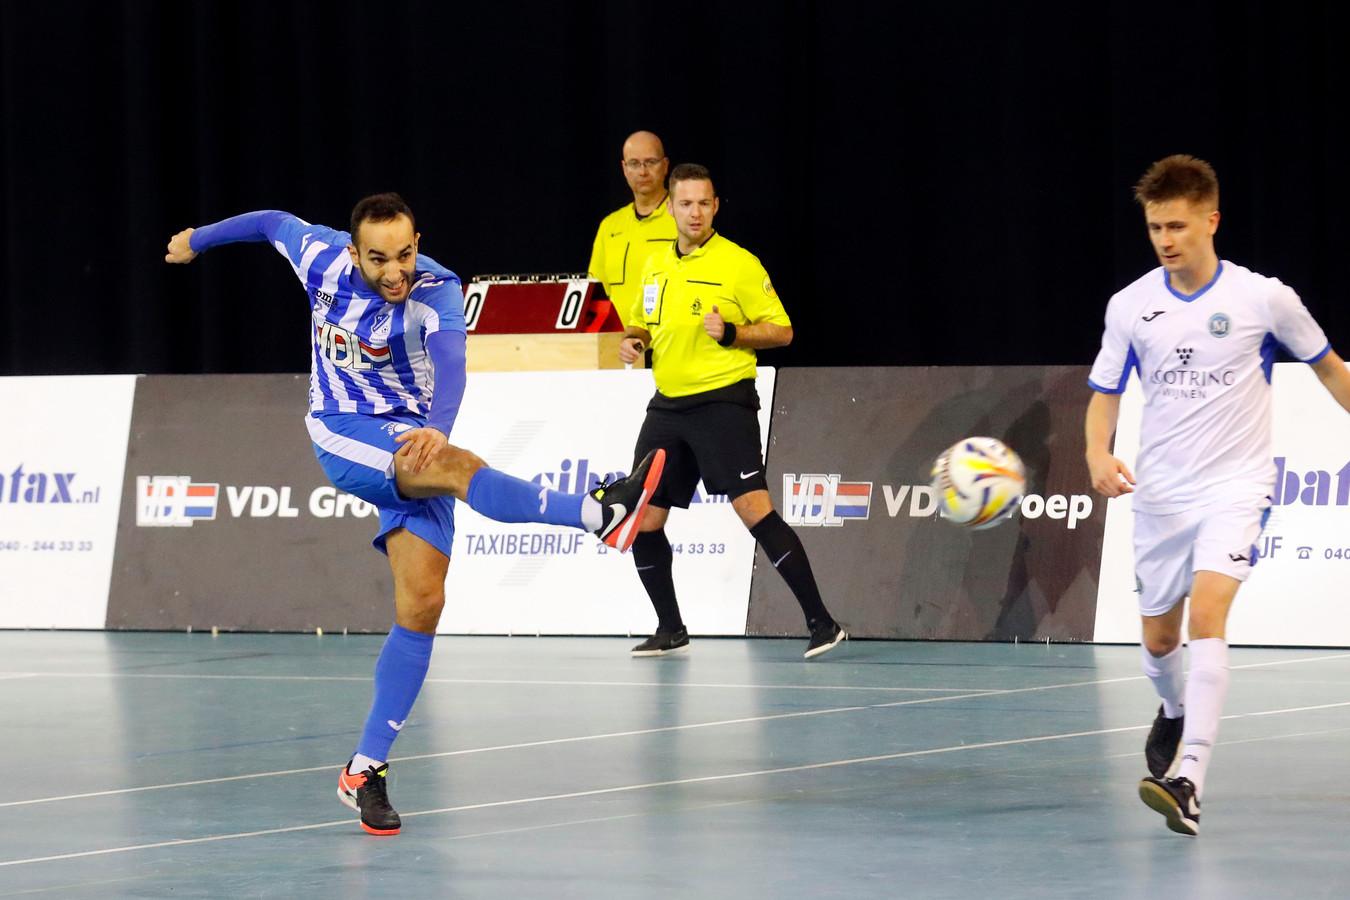 Archiefbeeld zaalvoetbal FC Eindhoven.